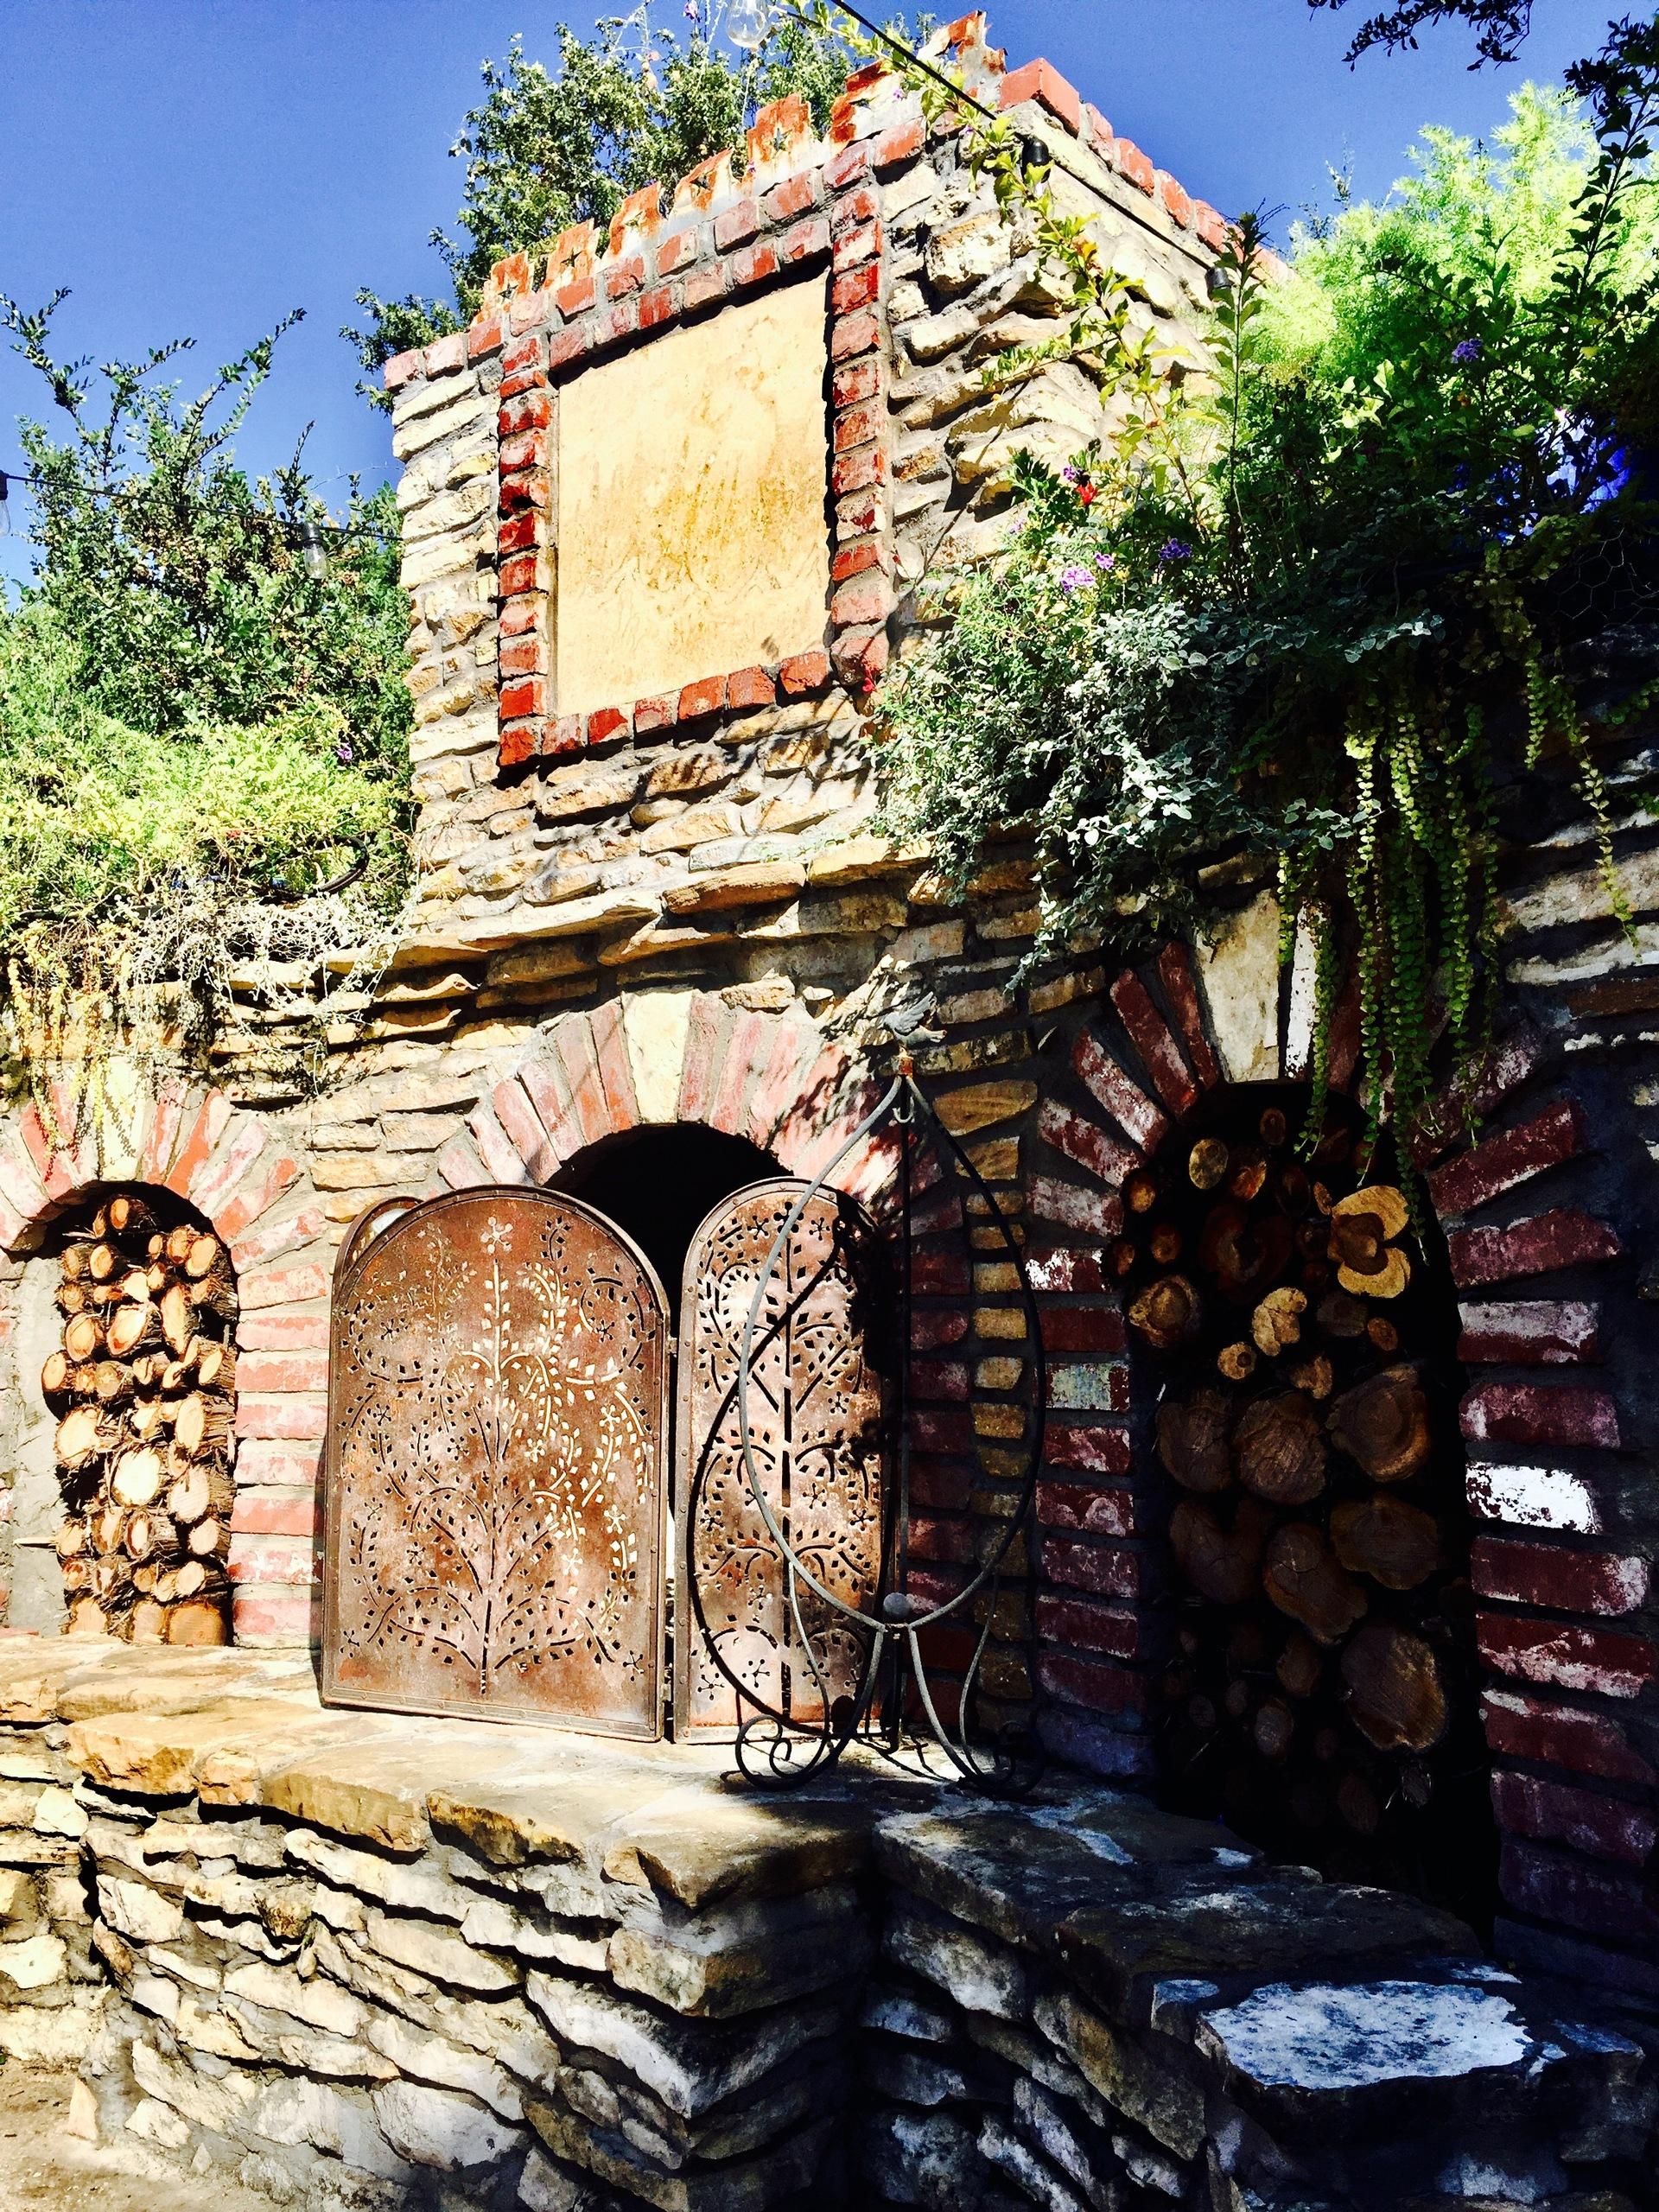 Outdoor brick fireplace  | laurelpcross, antique, architecture, building